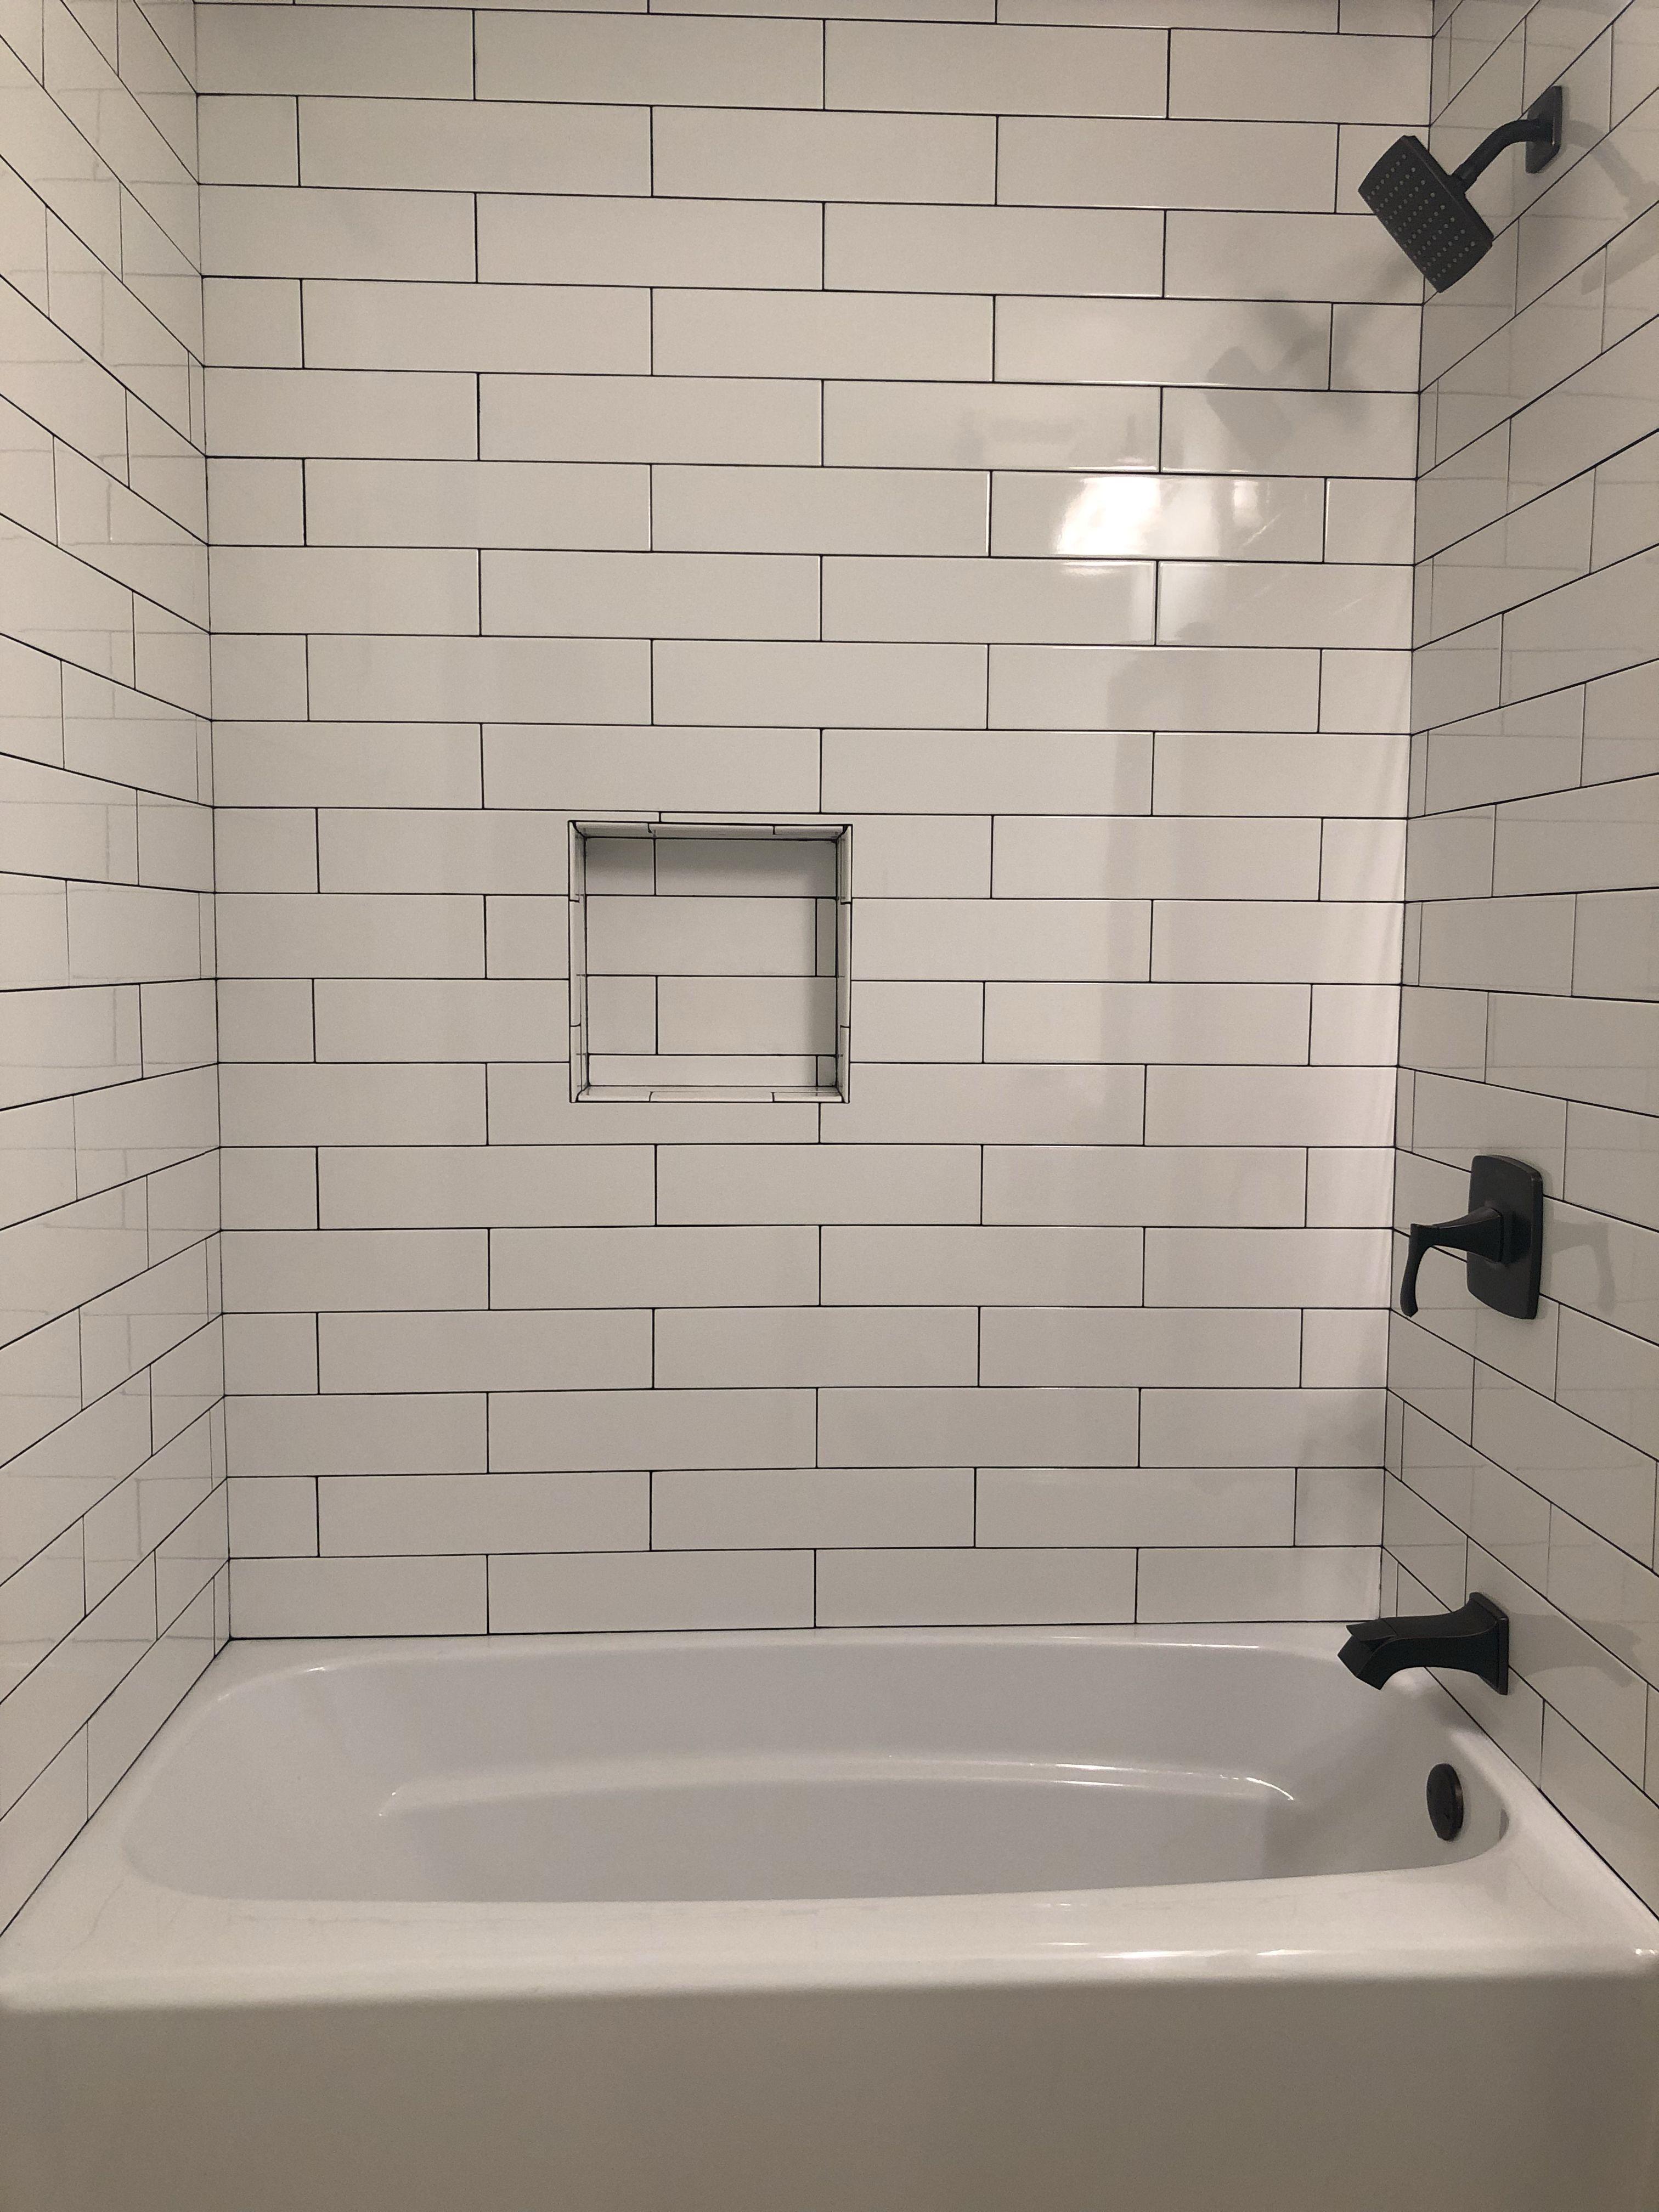 White Subway Tile Dark Grout Dark Fixtures Home Depot